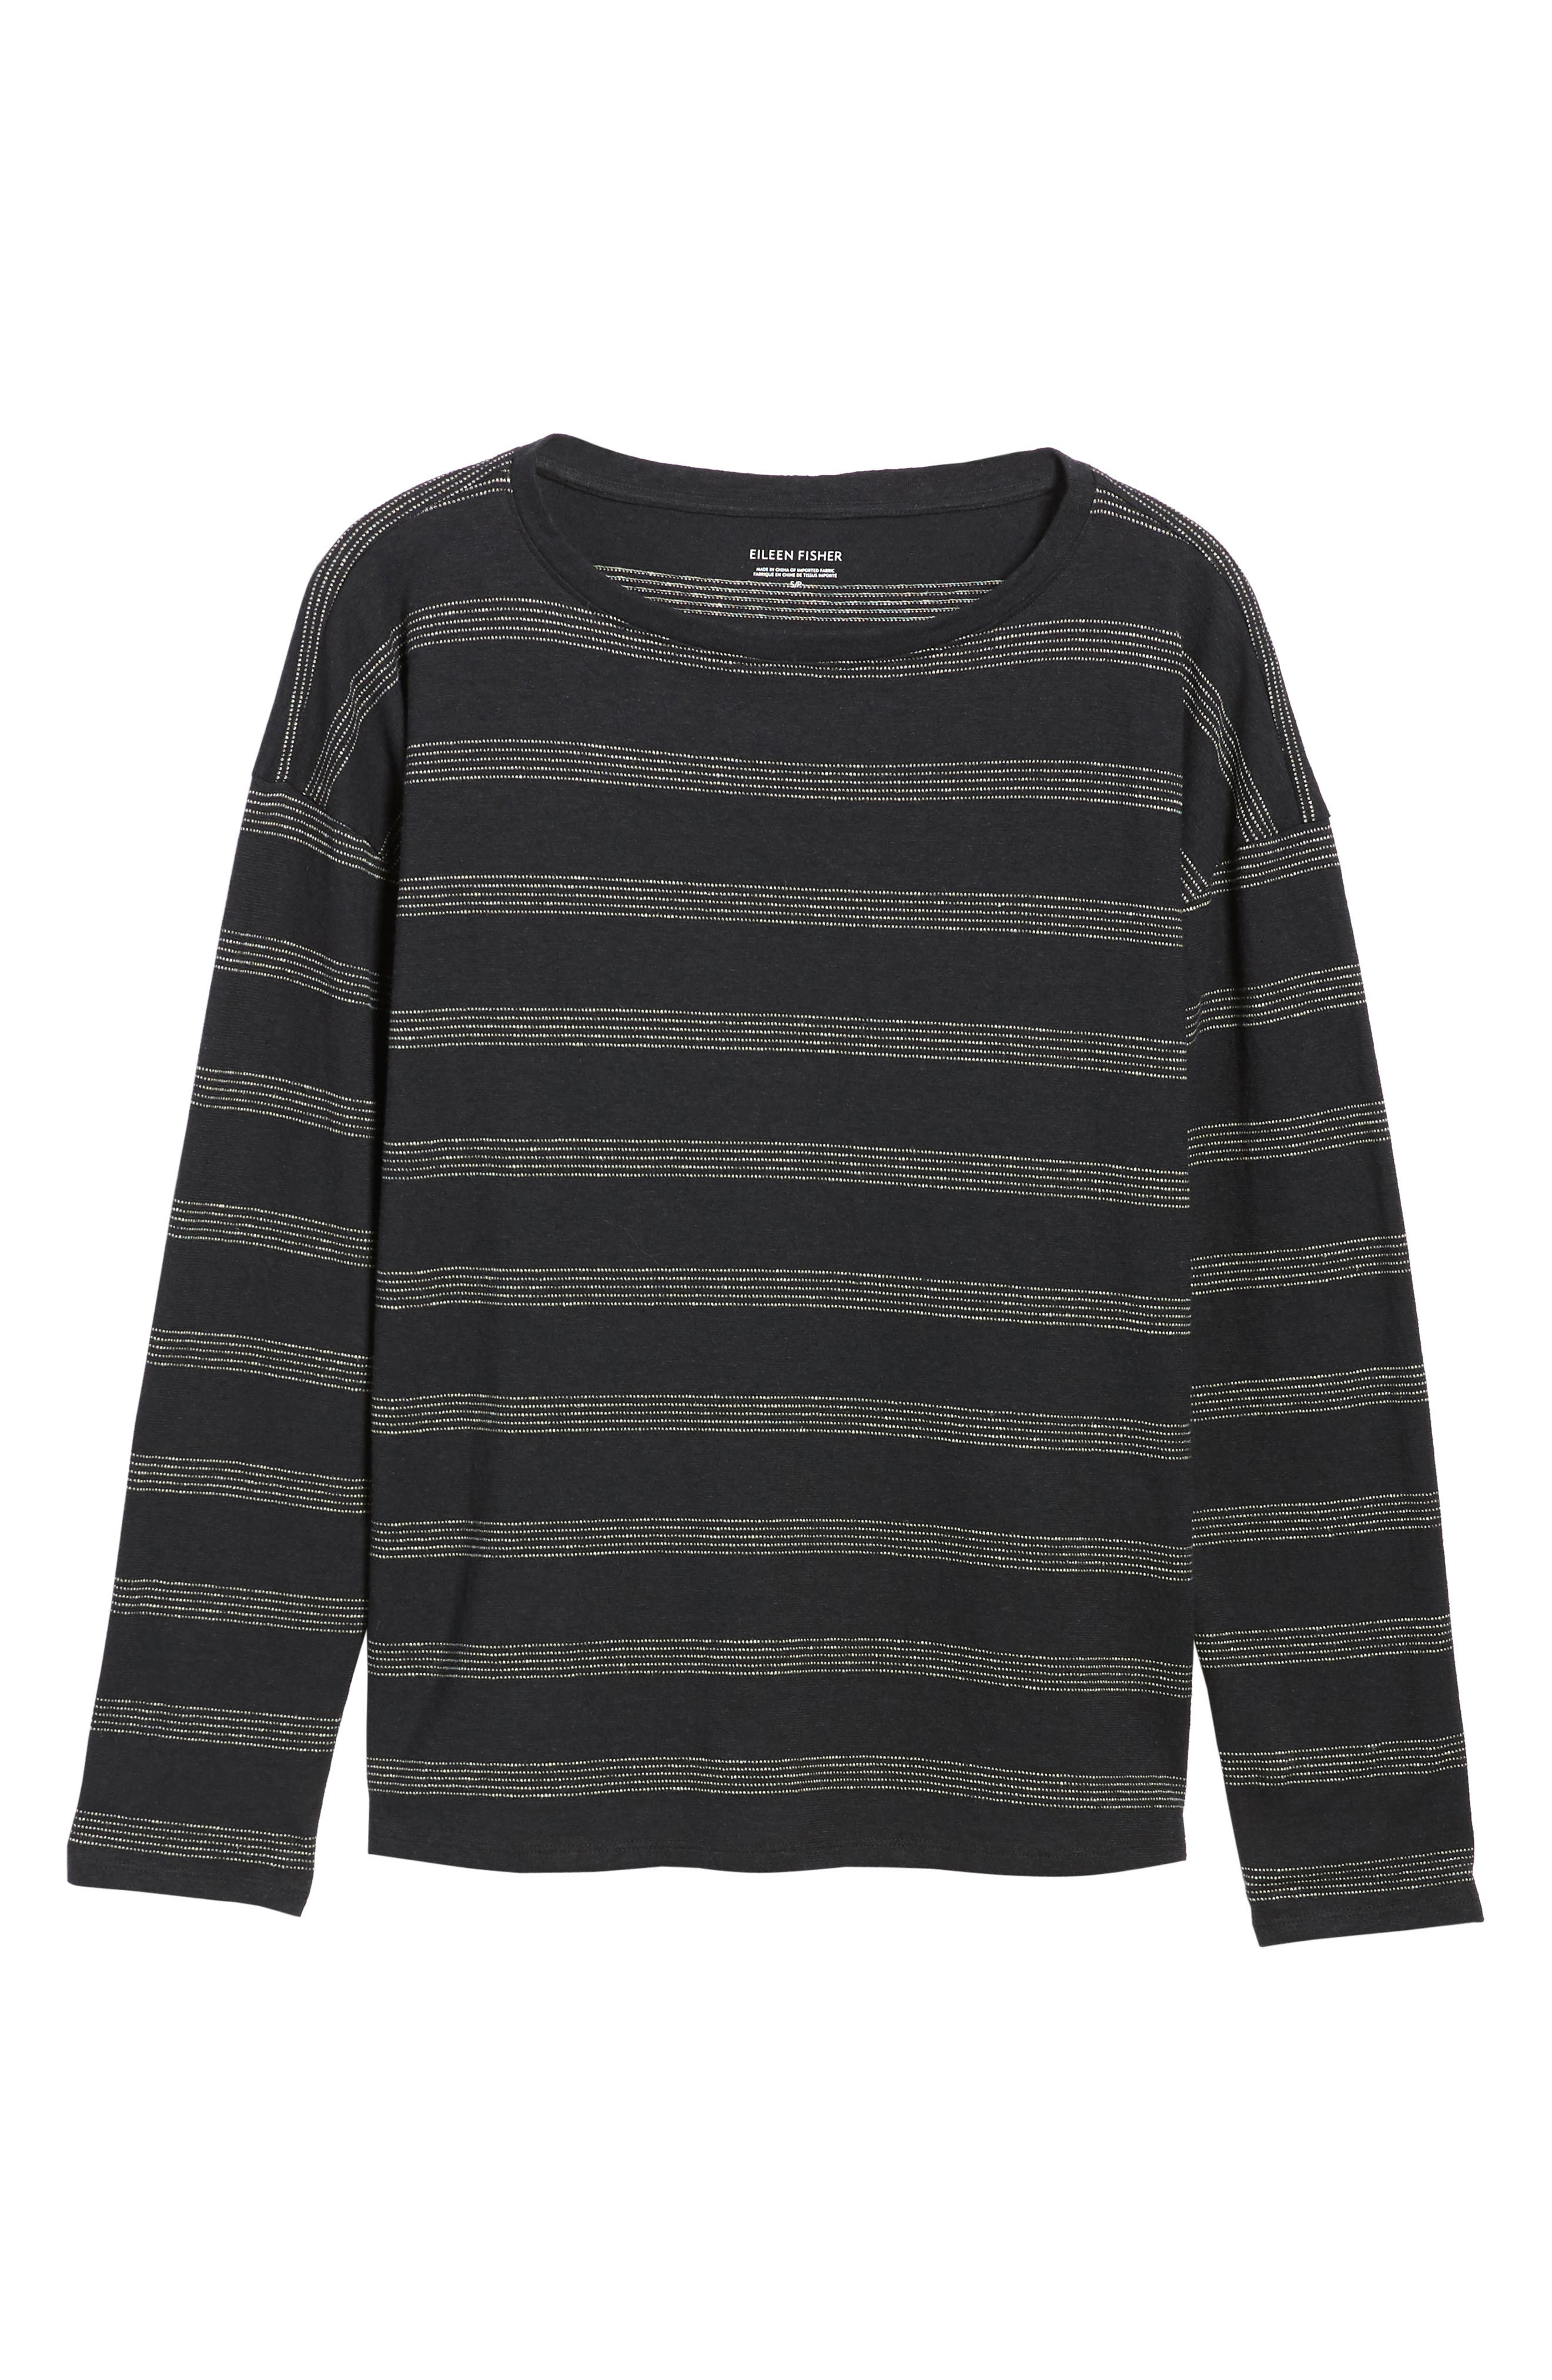 Stripe Hemp & Organic Cotton Top,                             Alternate thumbnail 6, color,                             Black